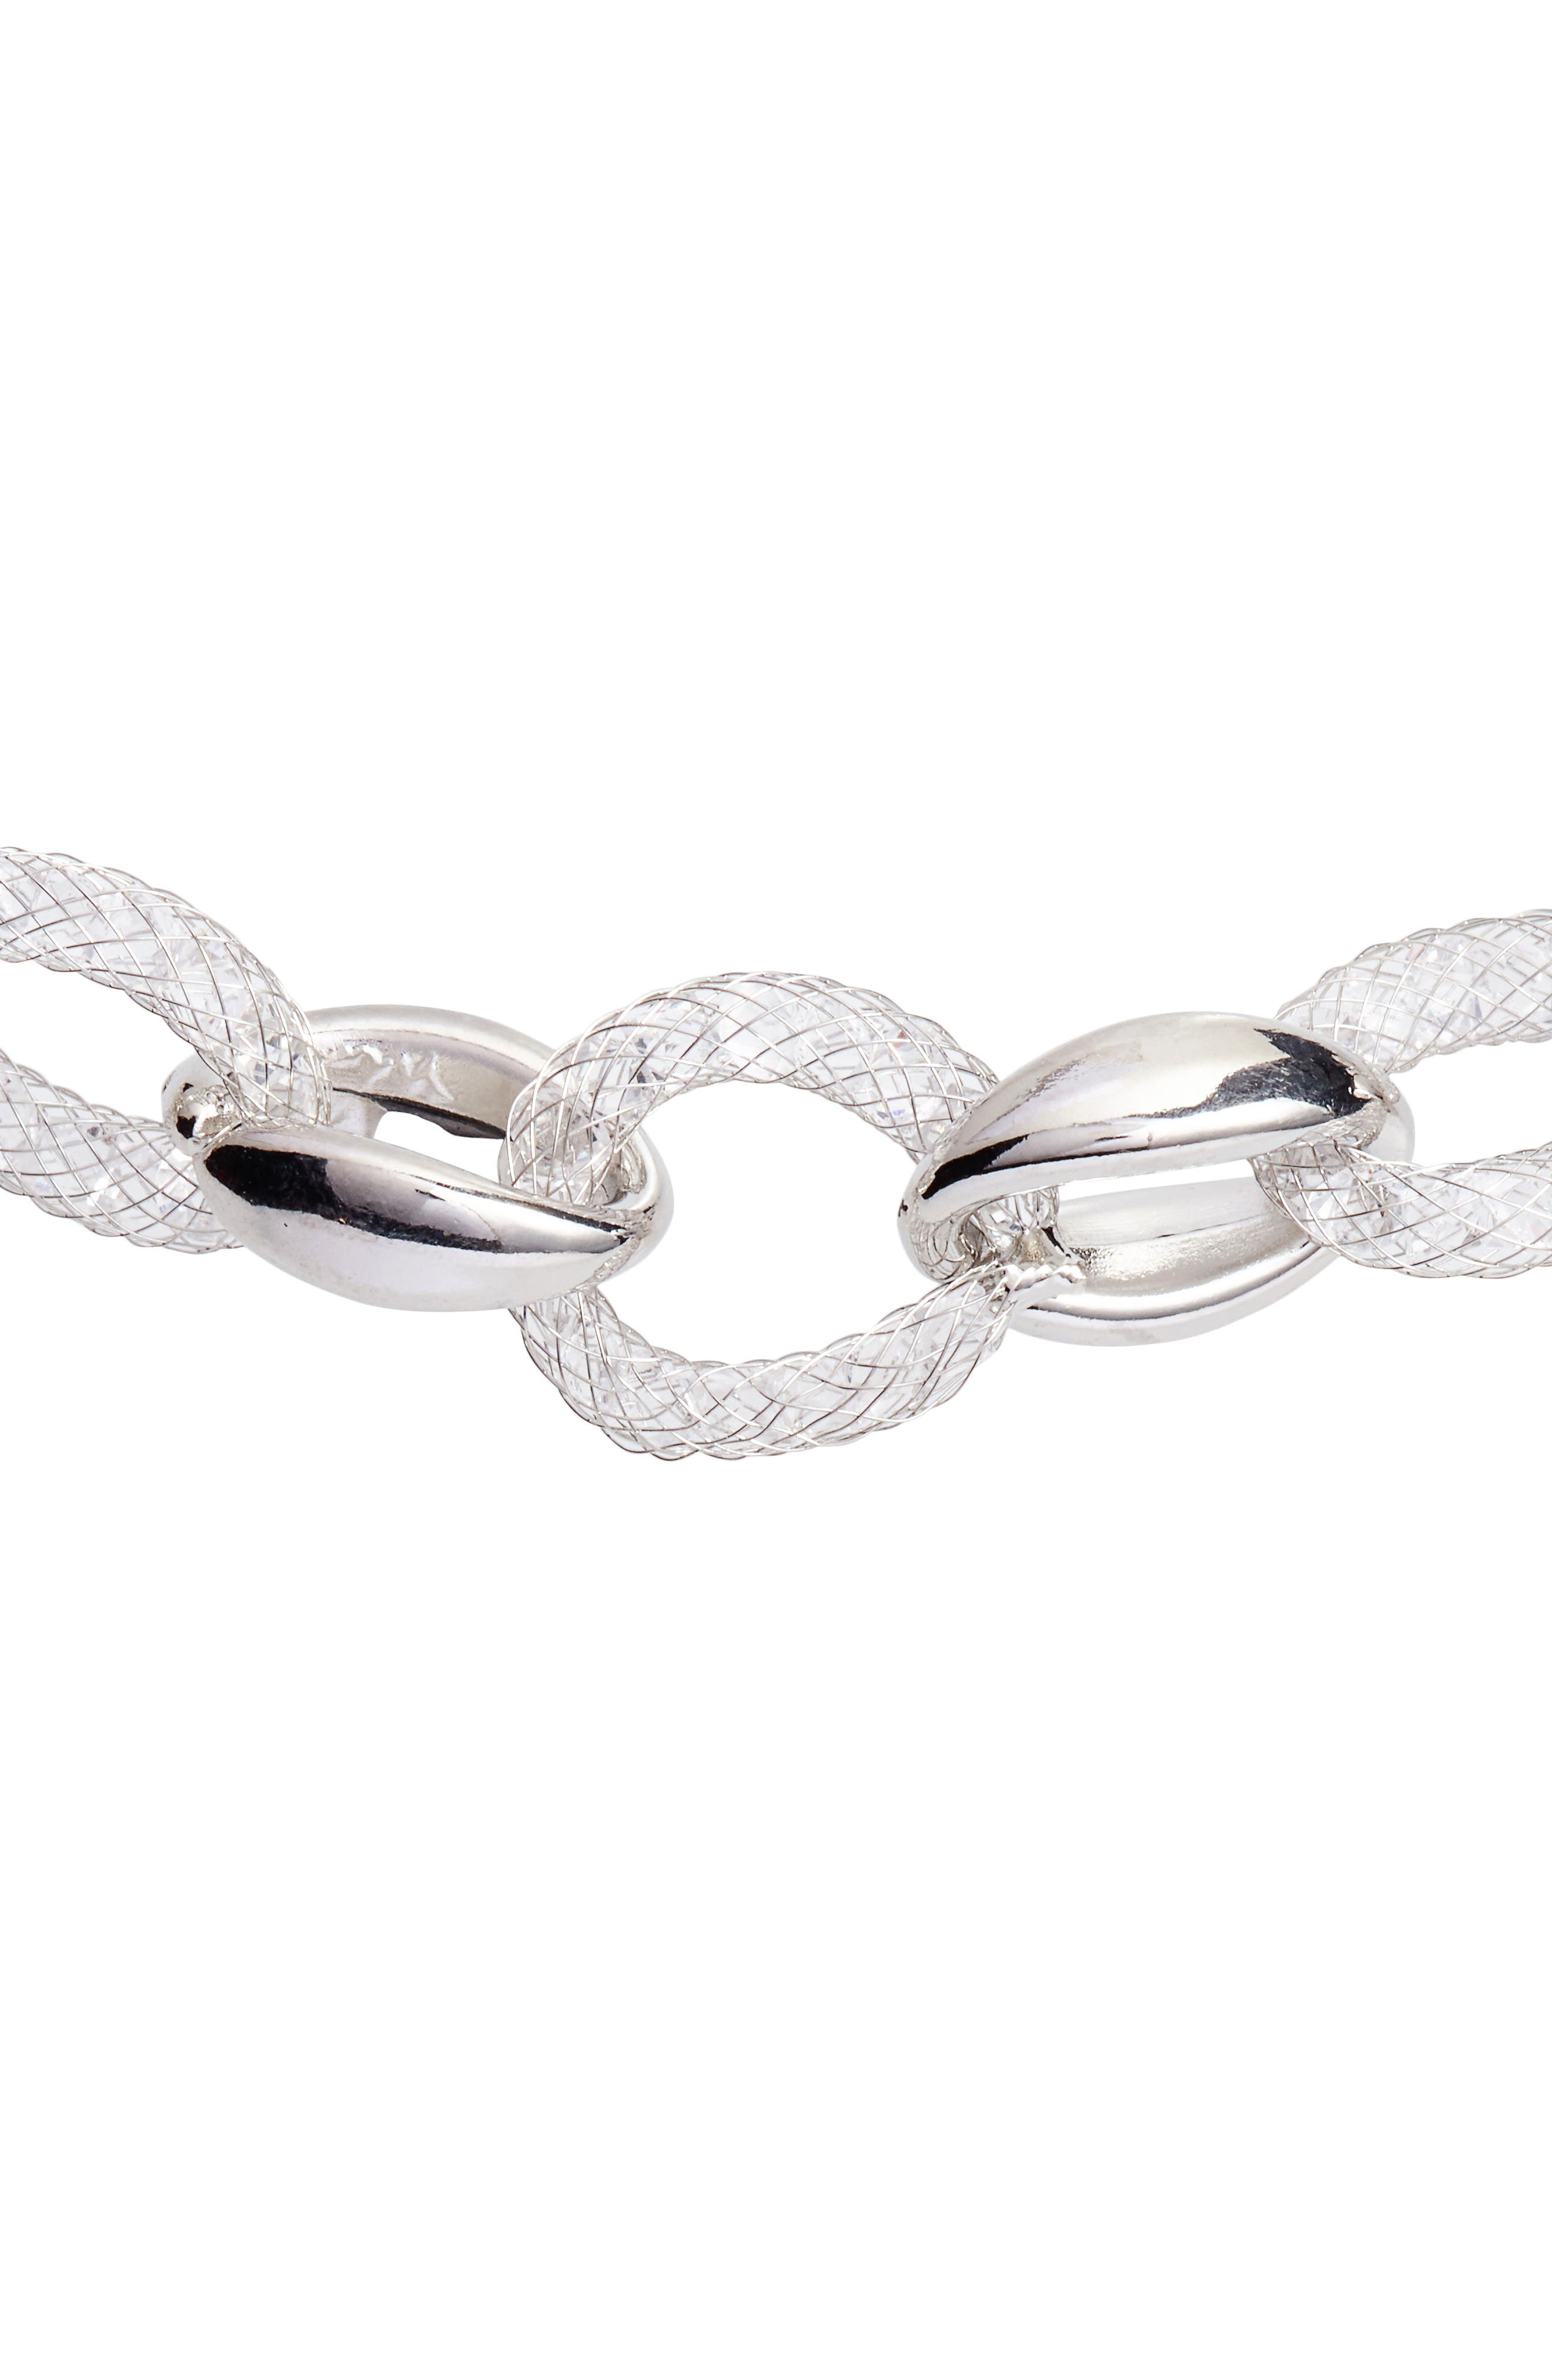 Marchella Chain Link Necklace,                             Main thumbnail 1, color,